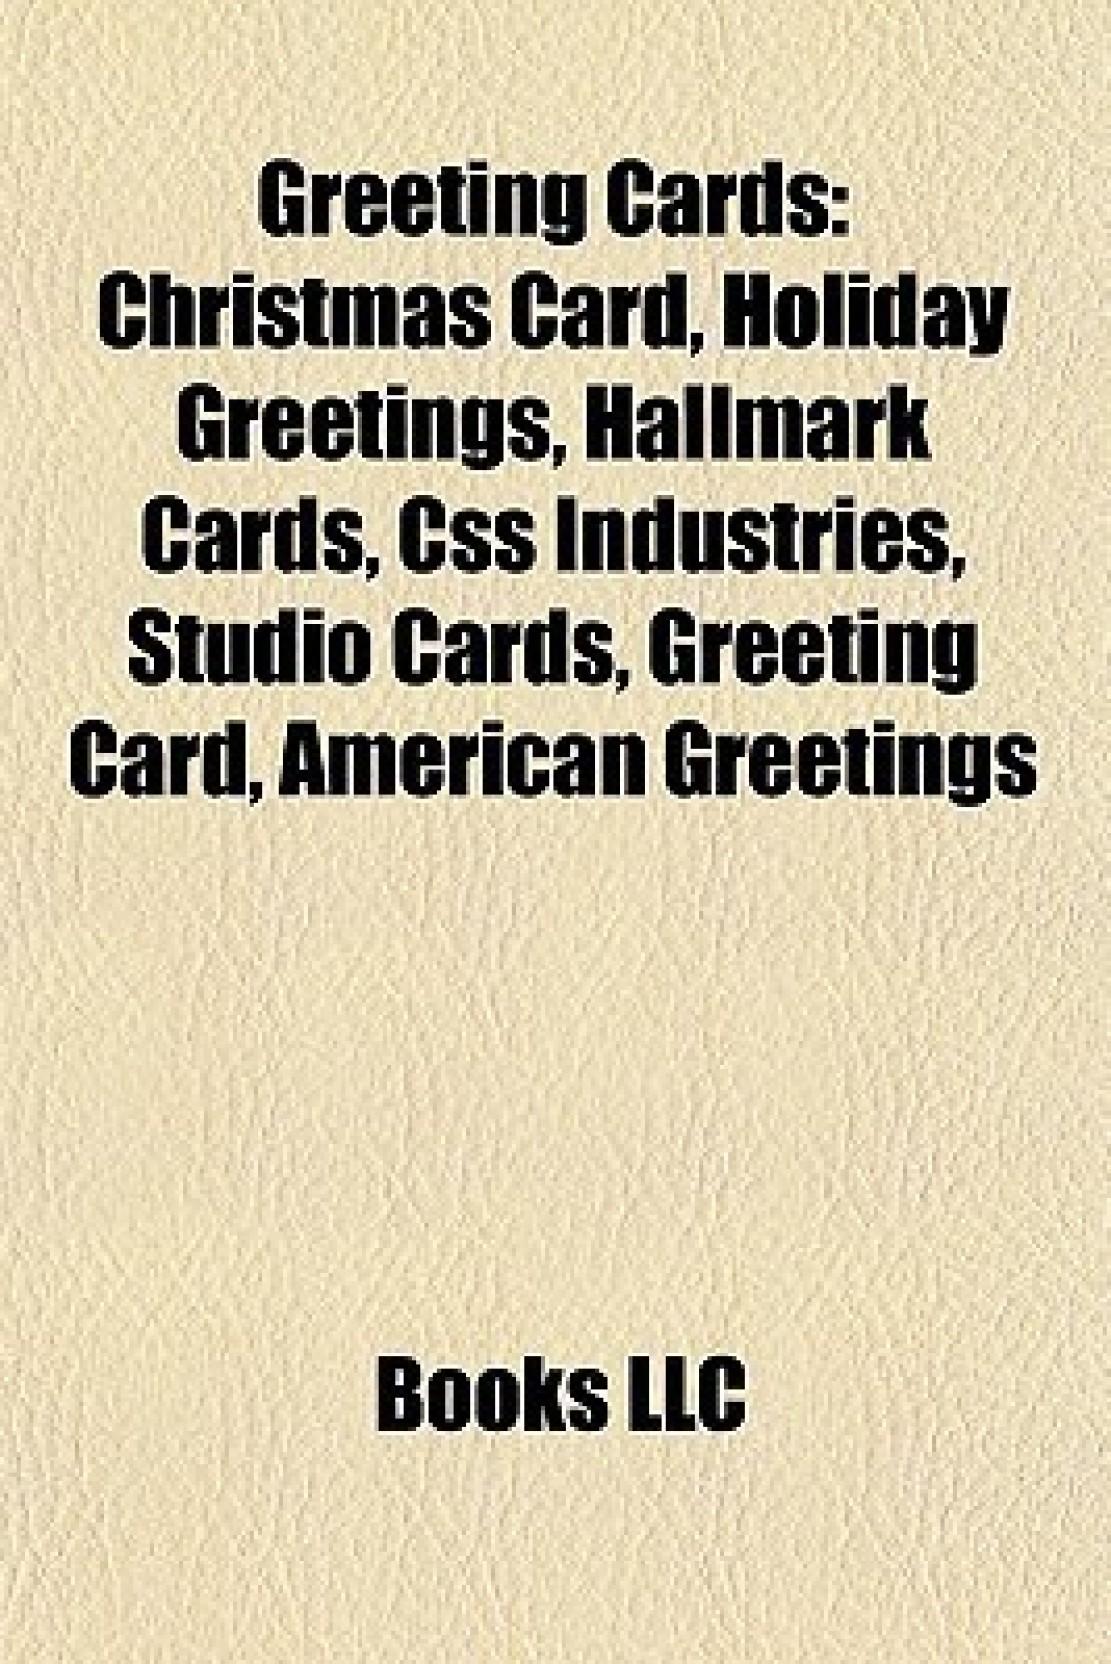 greeting cards christmas card holiday greetings hallmark cards